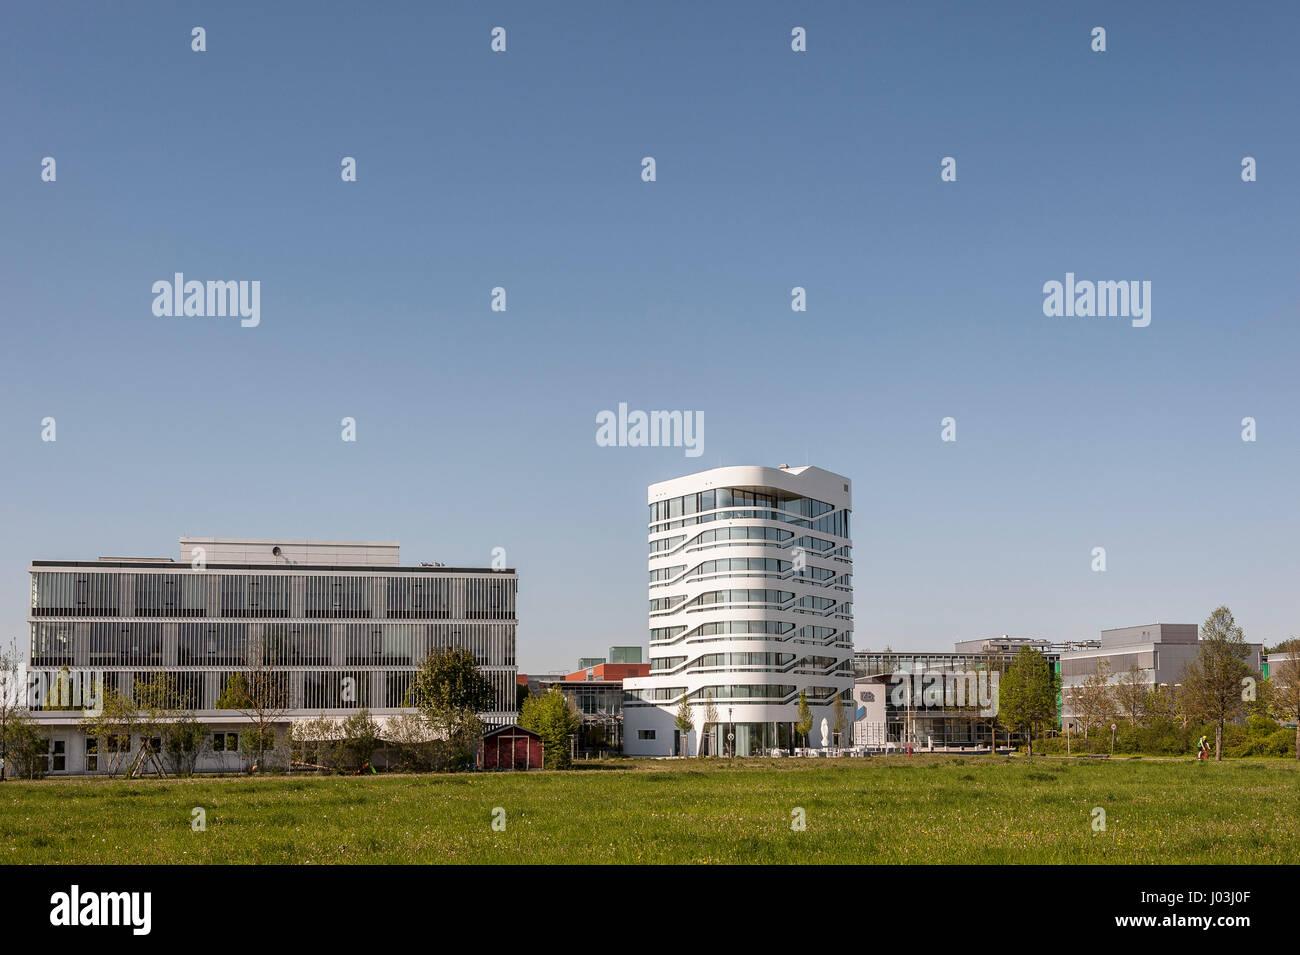 Innovation Center for Biotechnology IZB, Martinsried, near Munich, Bavaria, Germany - Stock Image